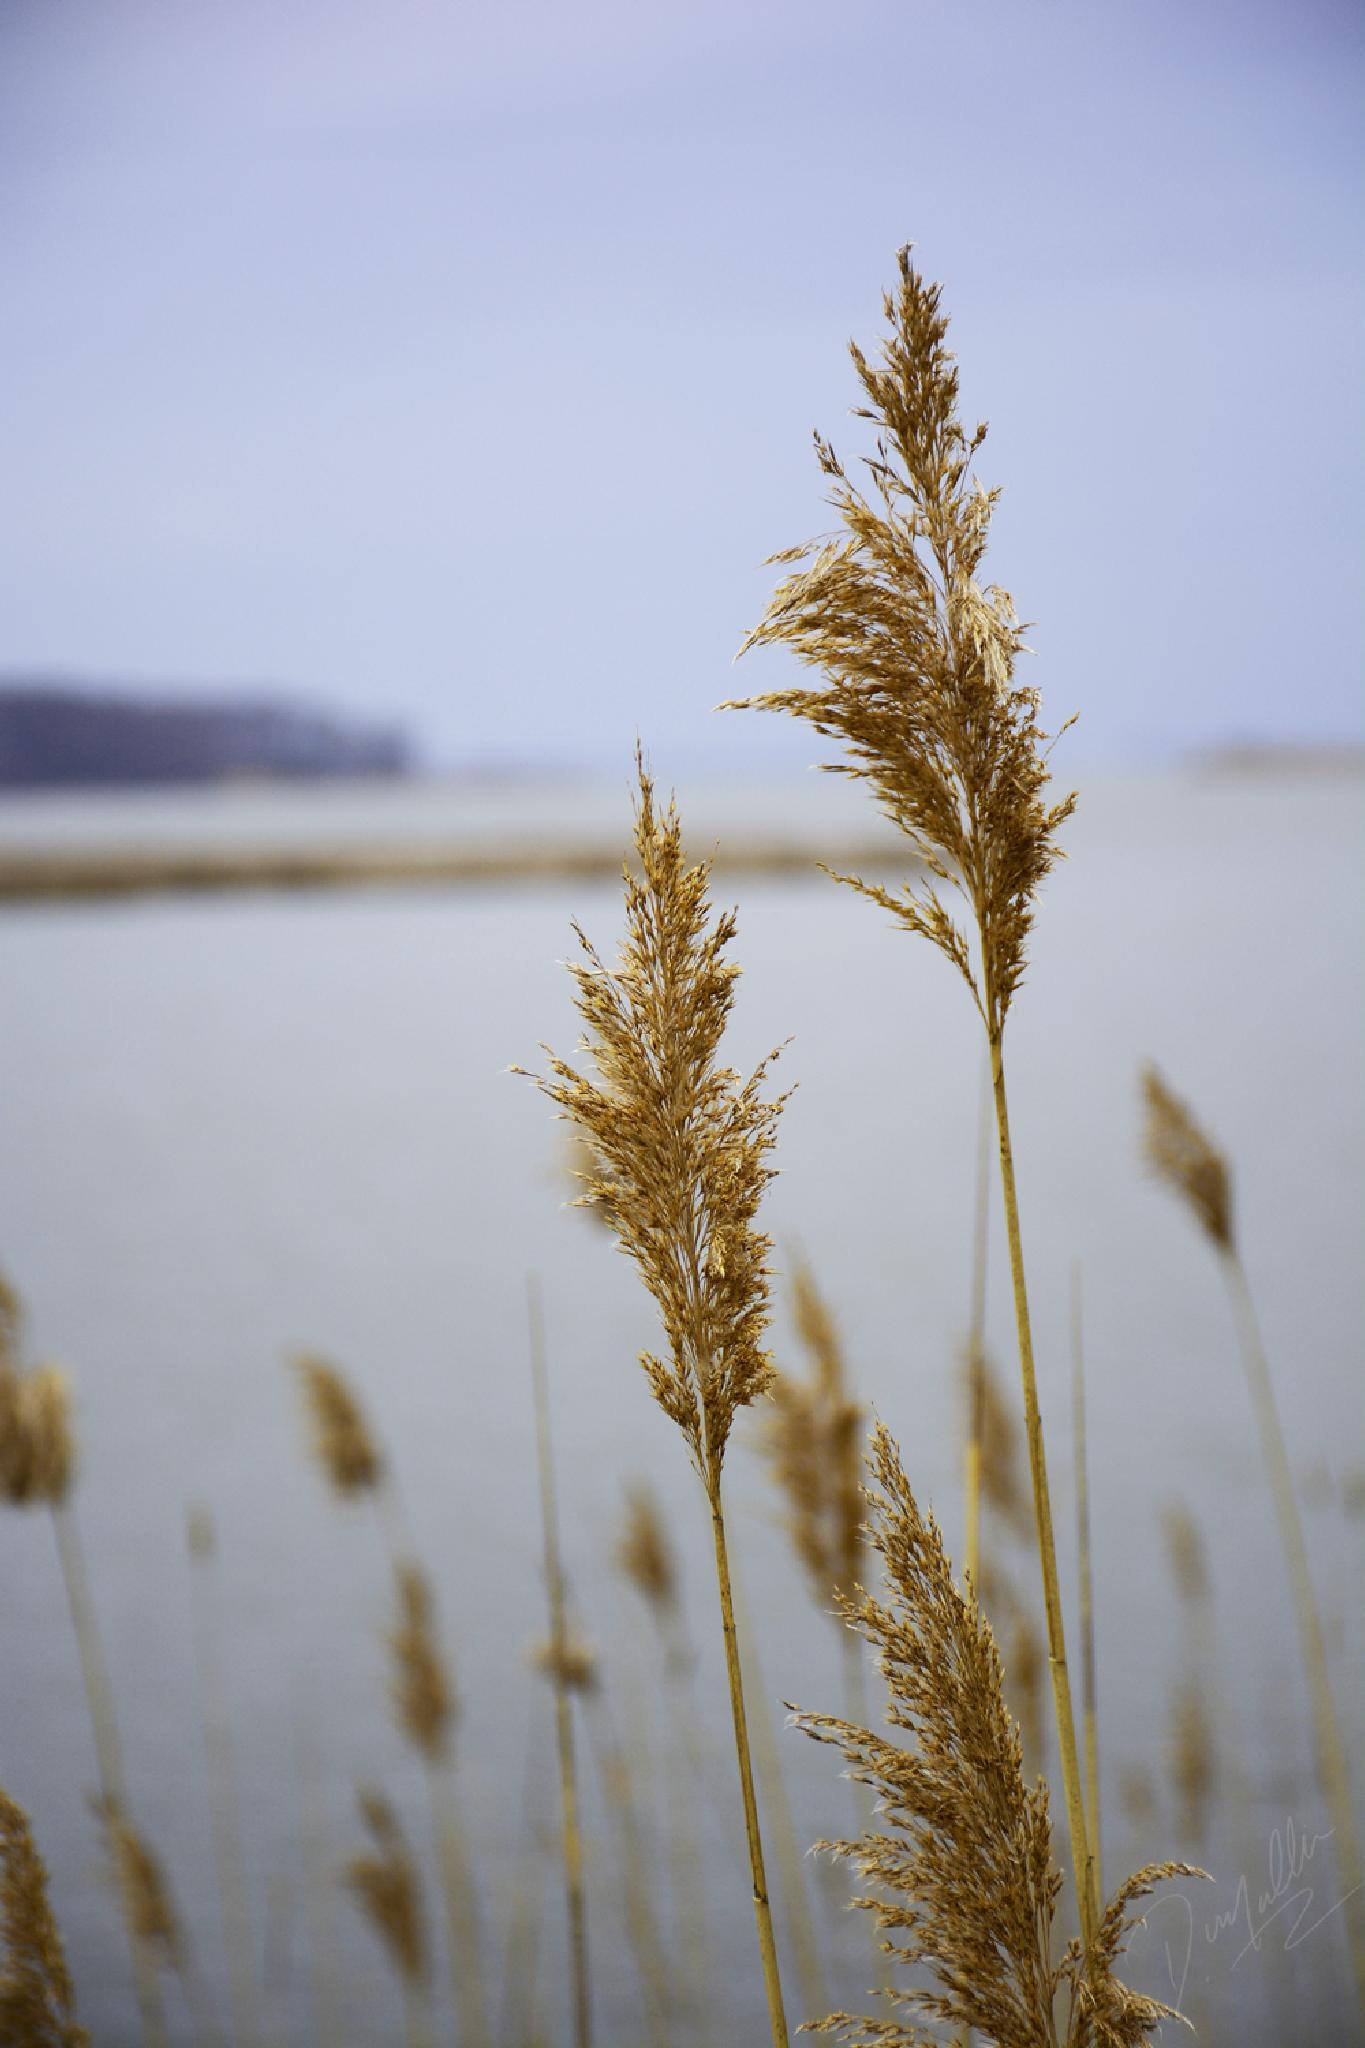 Indian Grass 1 by Dennis Mullin